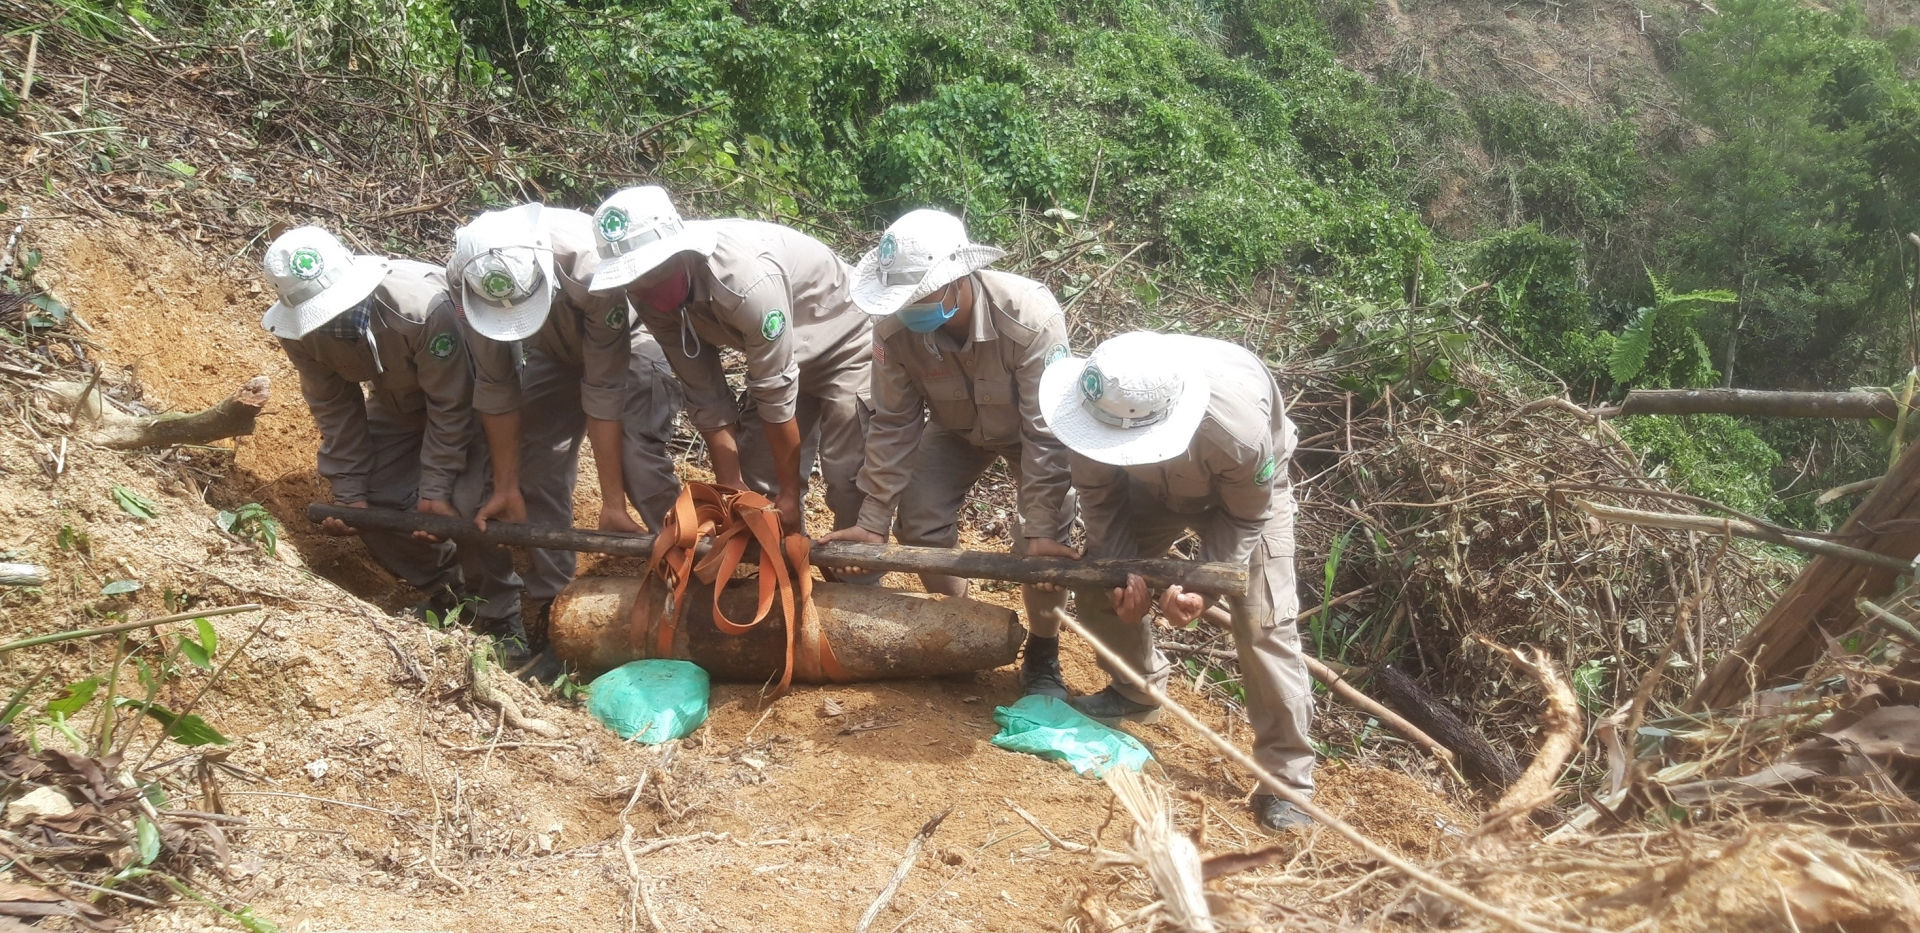 uxos clearance continues in vietnam despite pandemic